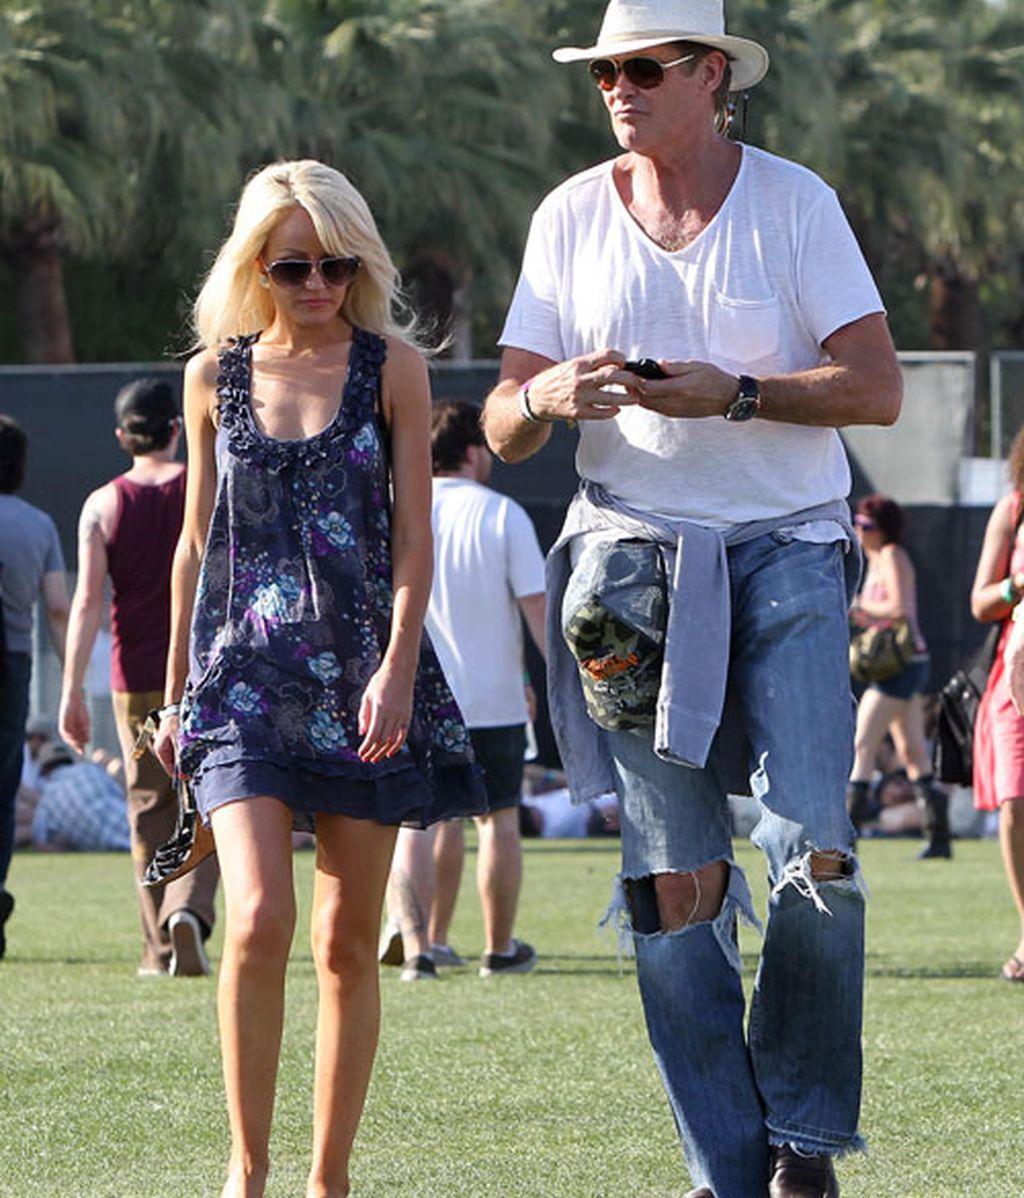 De Paris Hilton a David Hasselhoff, todos quieren ir al Coachella